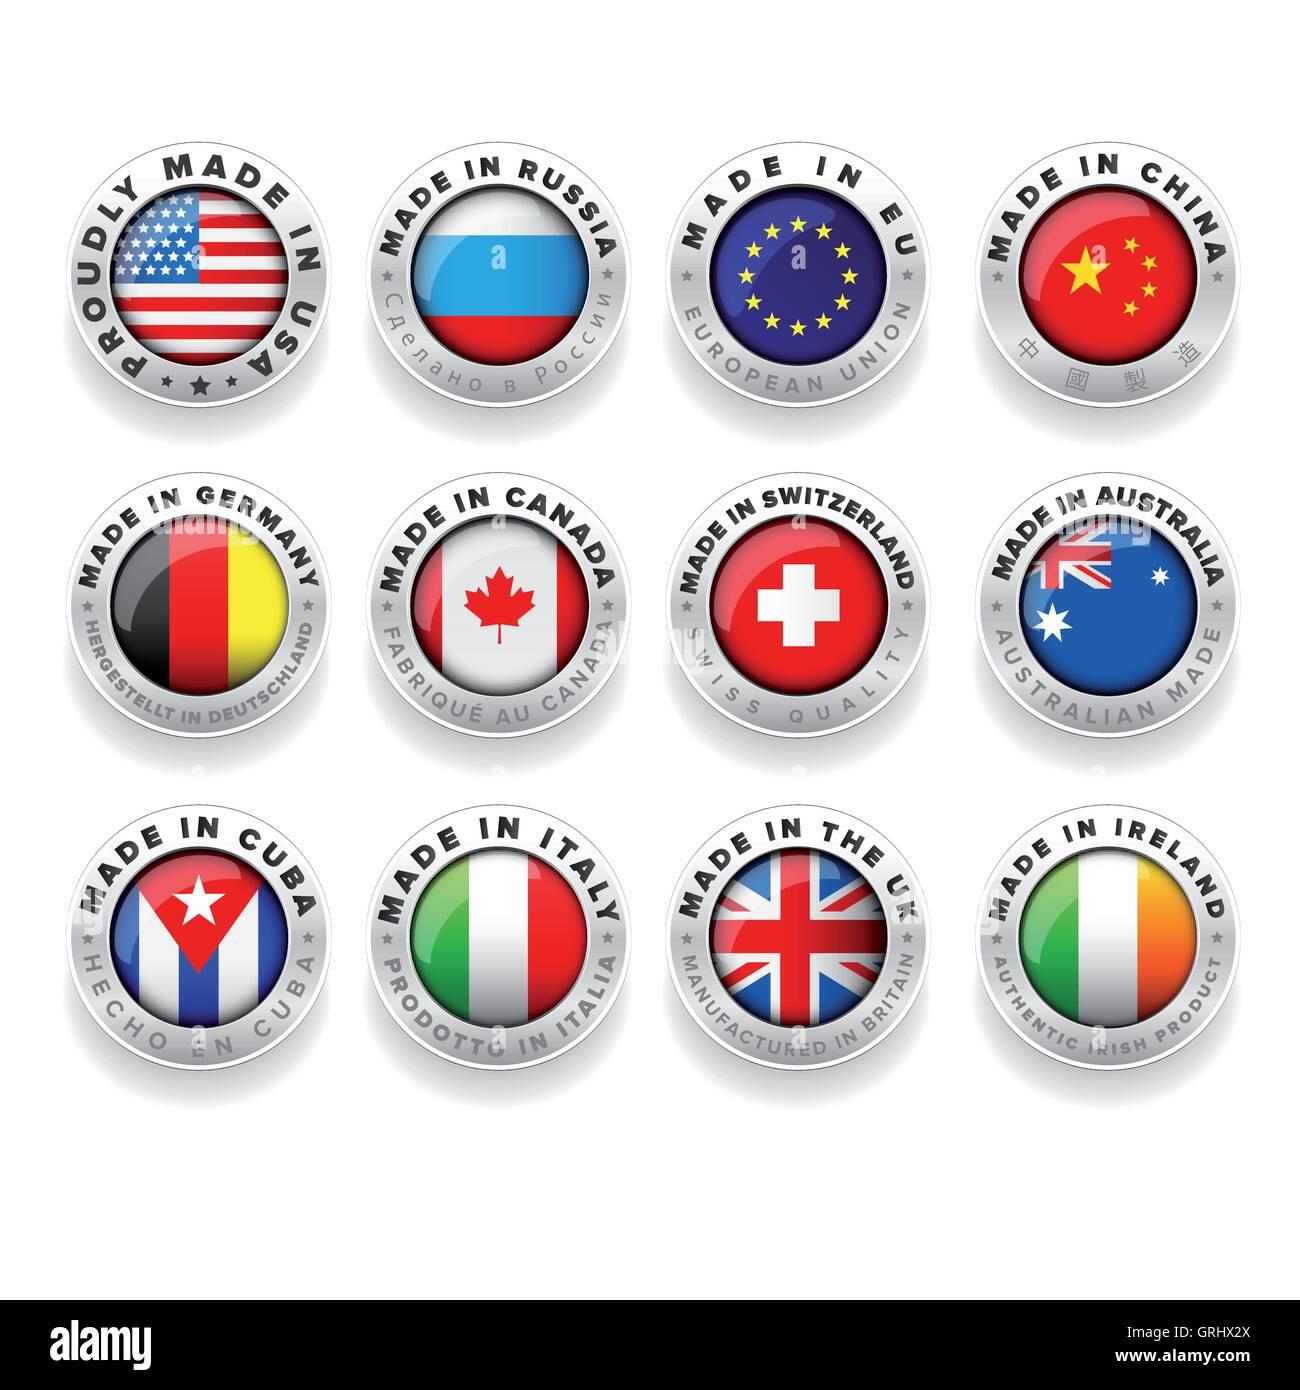 Made in Usa, Eu, China, Russia, Germany, Canada etc. - Stock Image